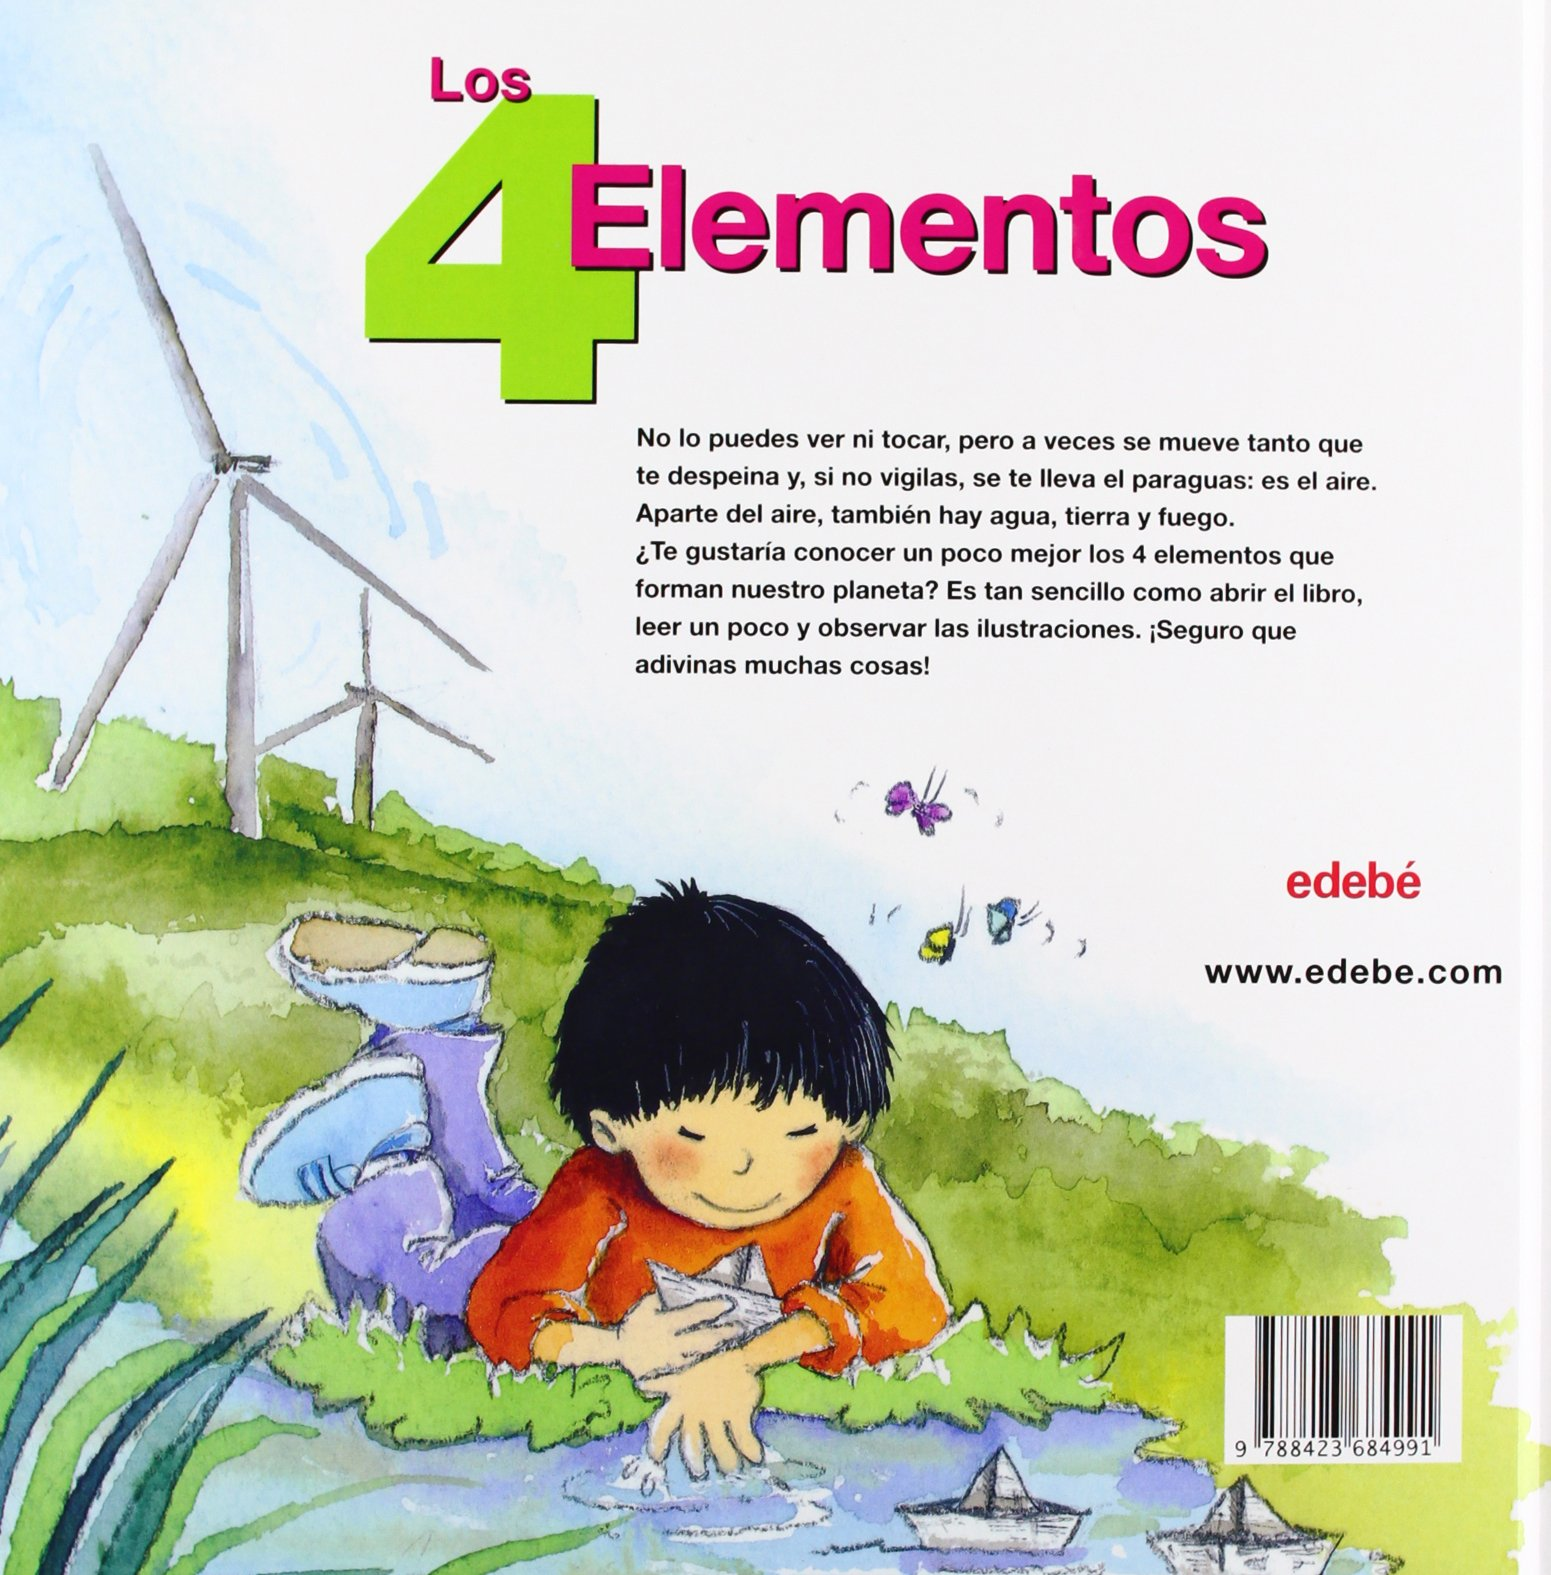 Los 4 elementos (Spanish Edition): Nuria Roca, Rosa Maria Curto, Rosa M. Curto: 9788423684991: Amazon.com: Books